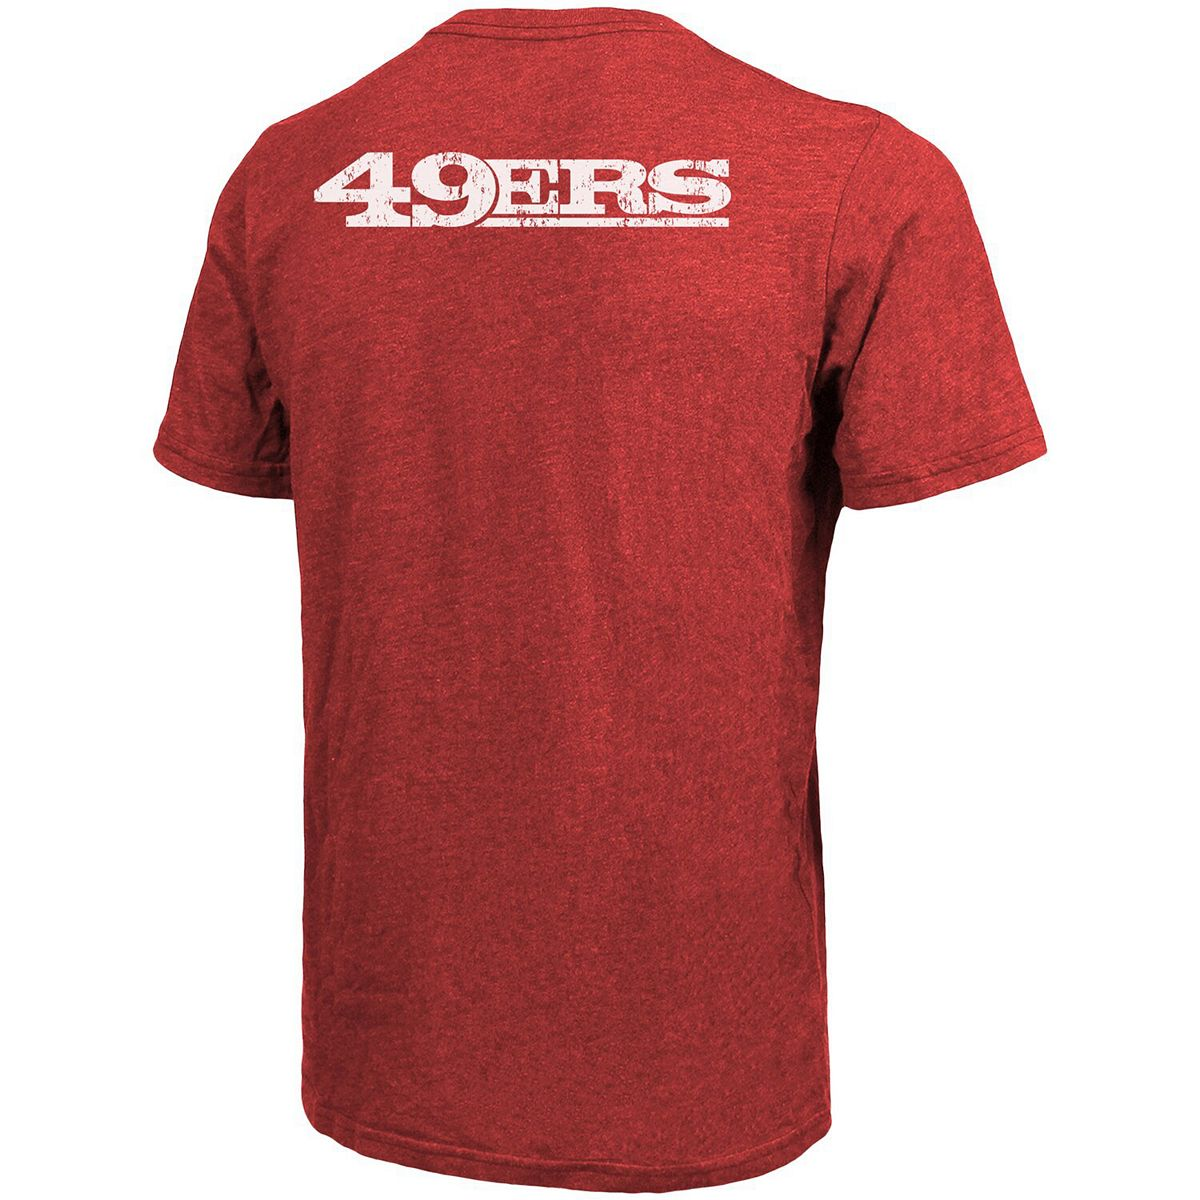 San Francisco 49ers Majestic Threads Tri-Blend Pocket T-Shirt - Scarlet XTZ1a